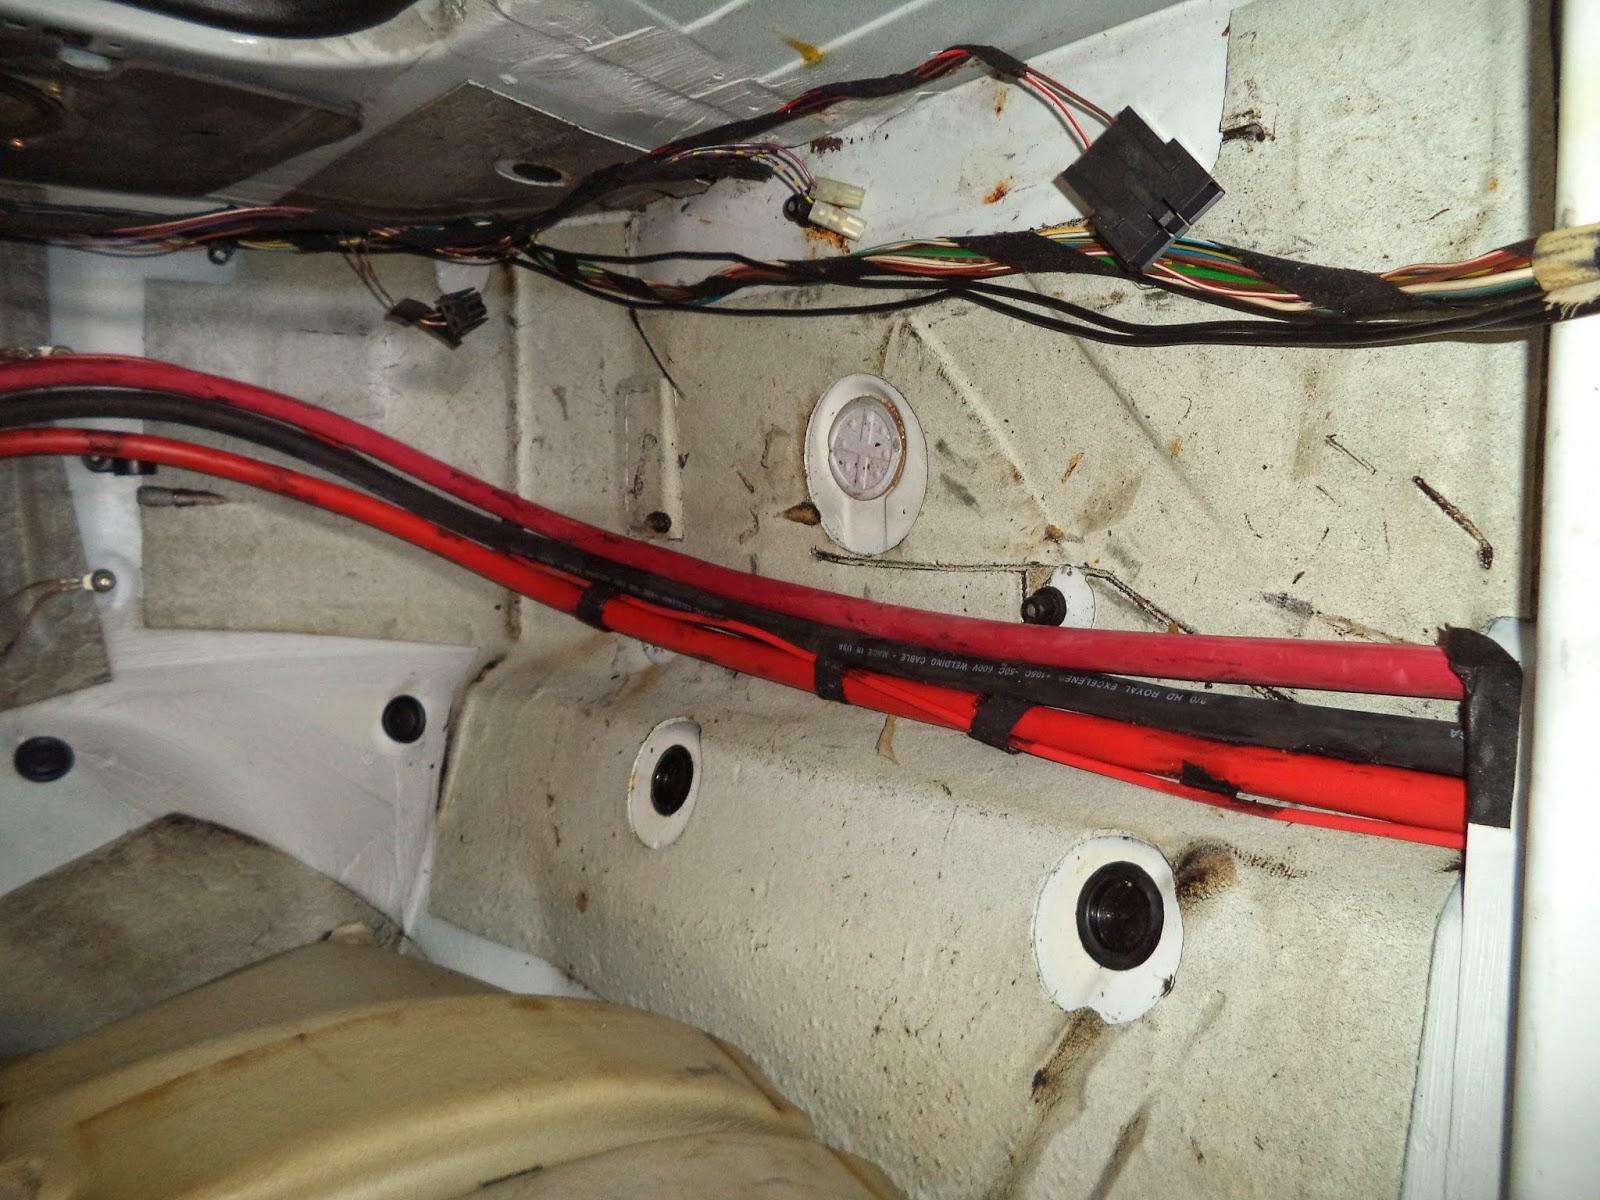 bmw battery wiring chasingdeer co uk u2022 rh chasingdeer co uk